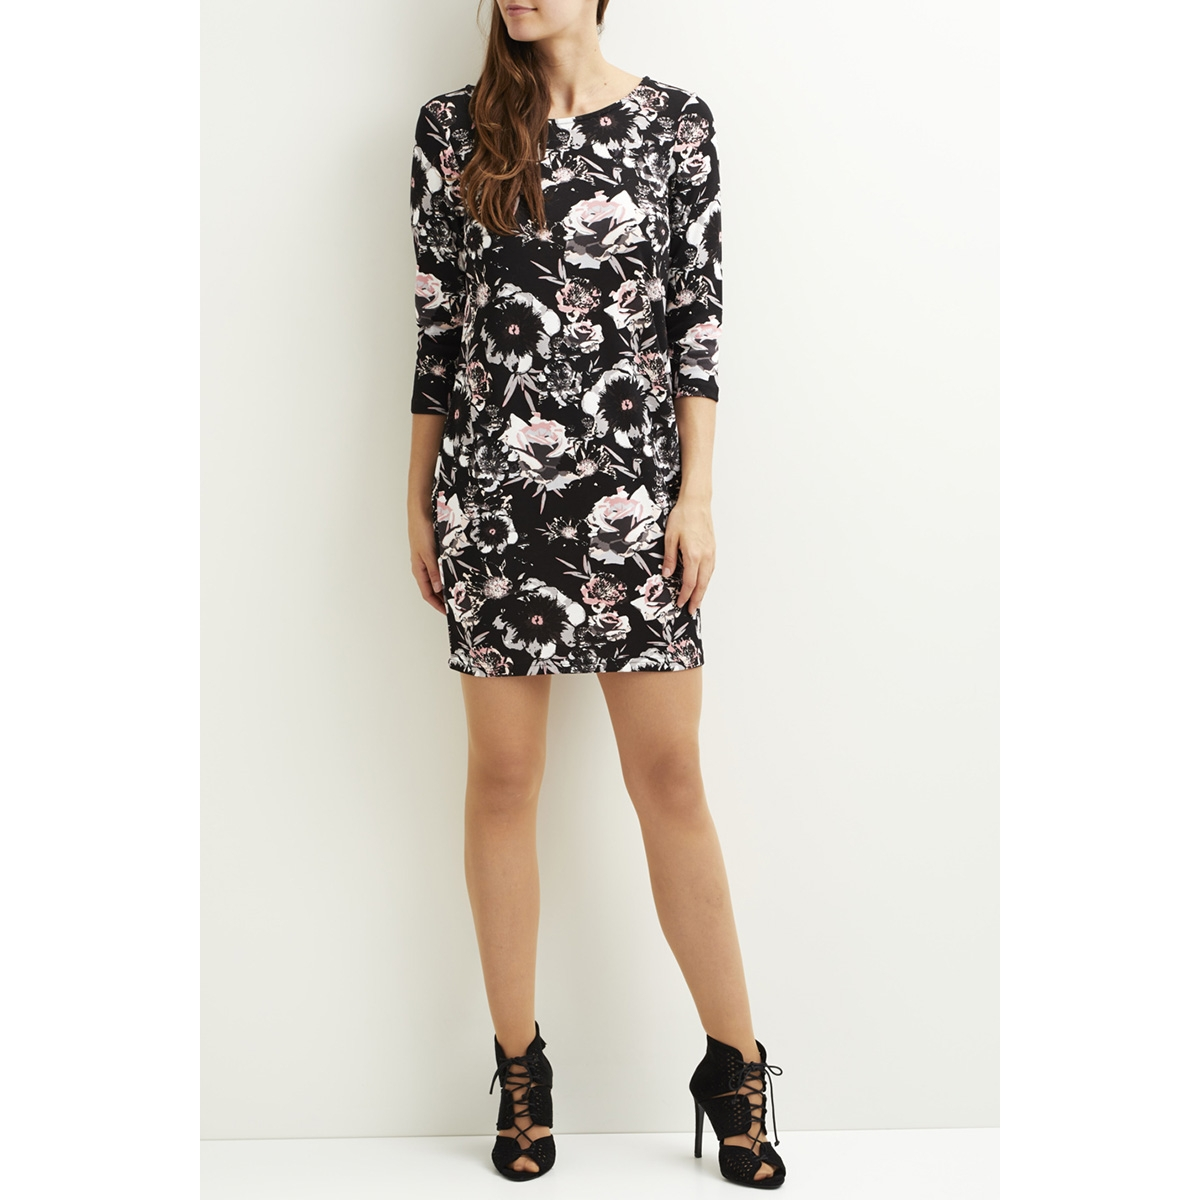 vitinny 3/4 astha dress 14046310 vila jurk black/viastha 2n